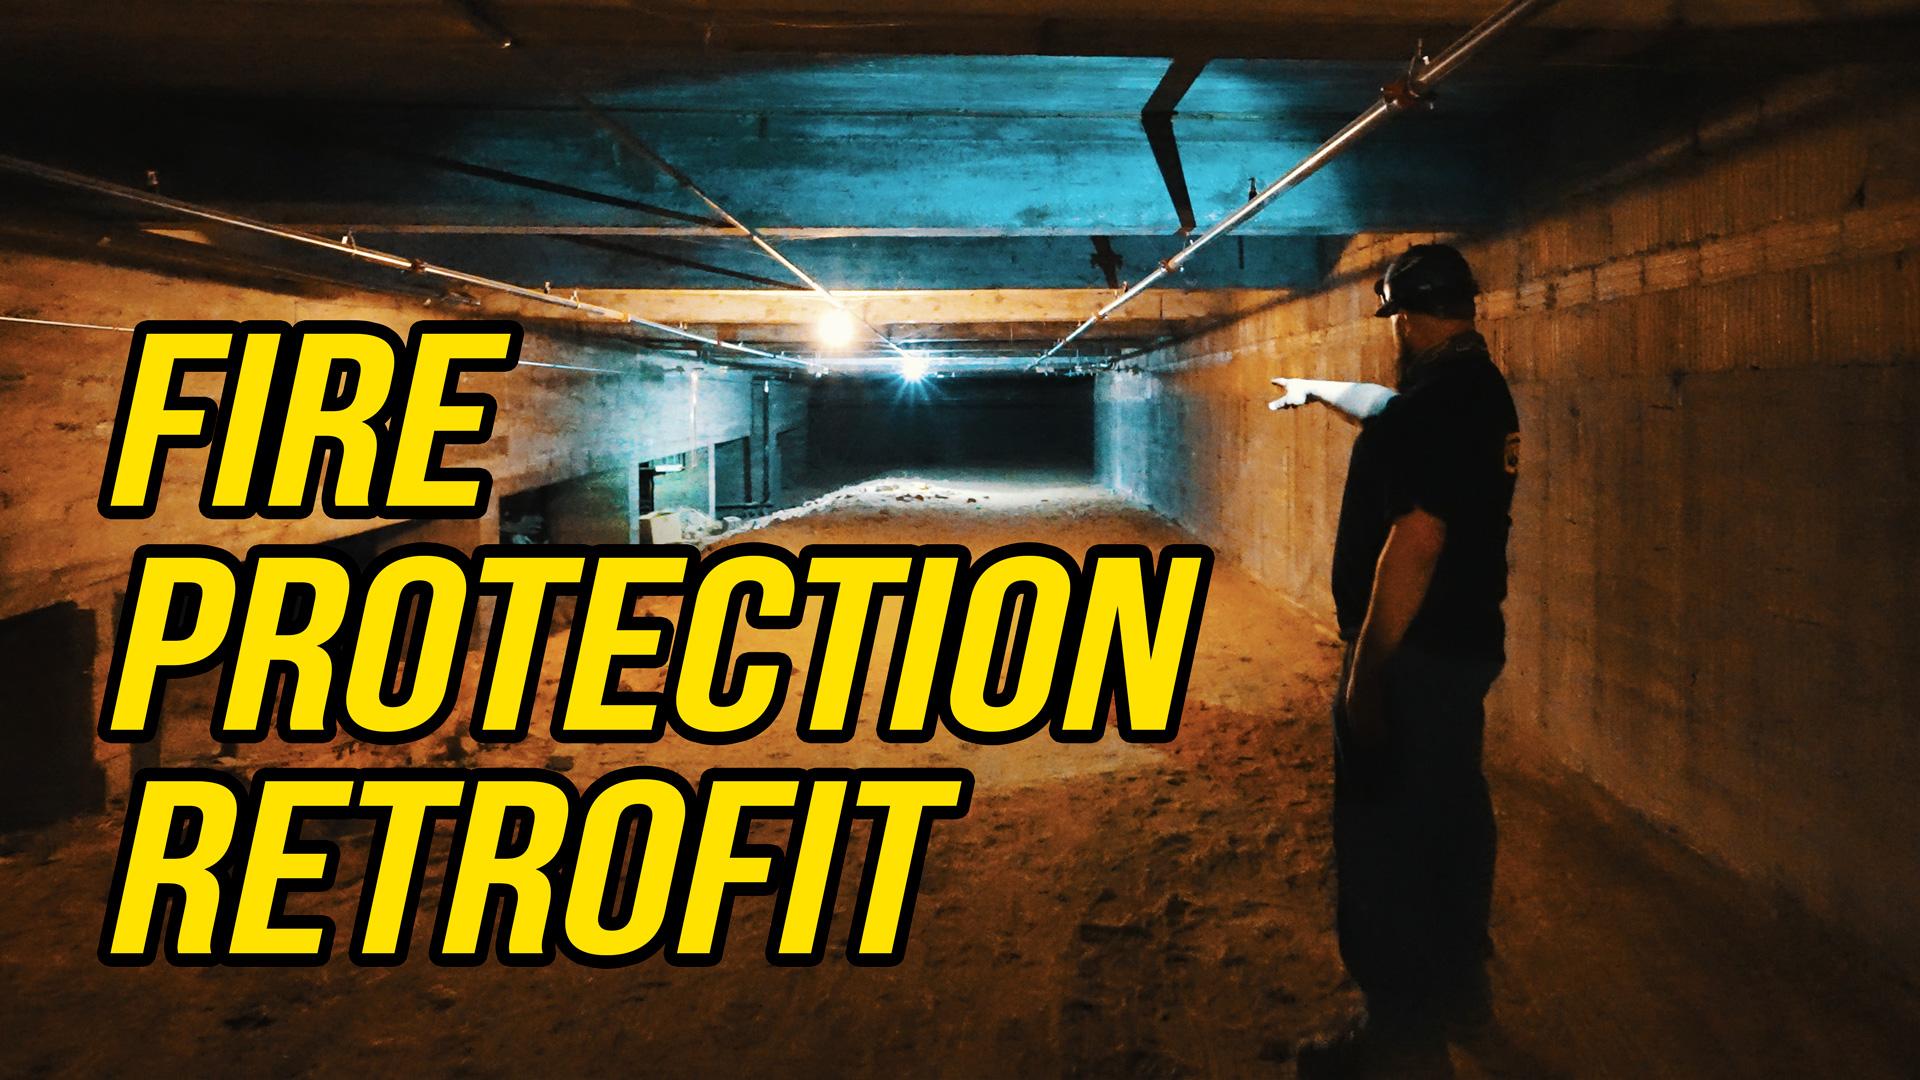 Fire Protection Retrofit - Underground Work